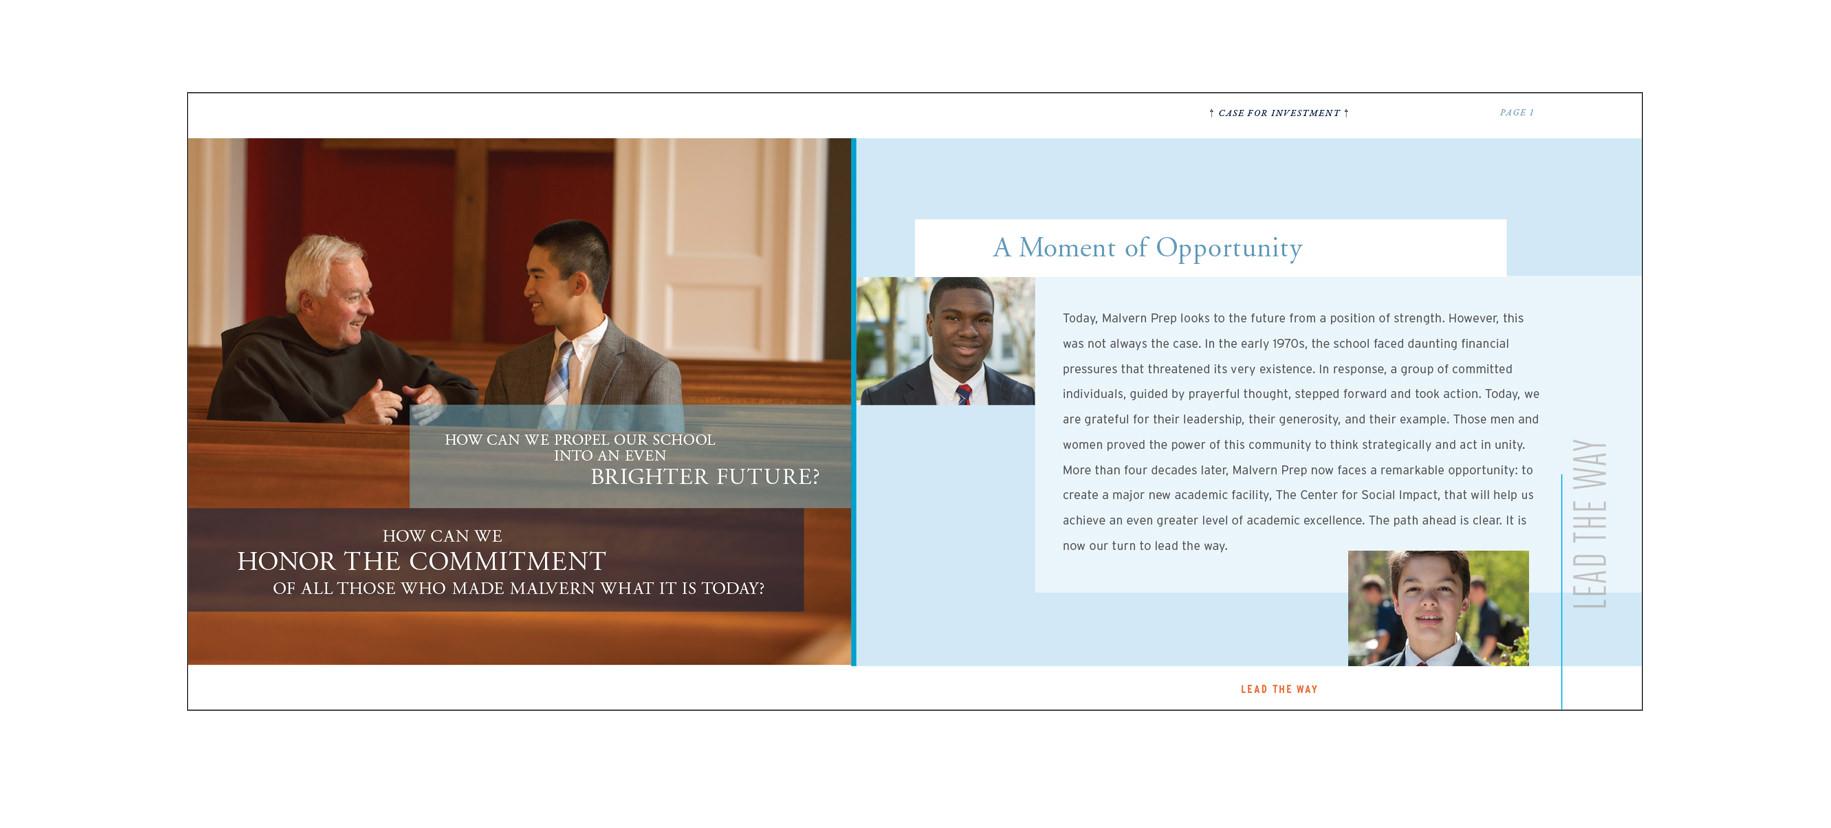 kelsh-wilson-design-malvern-prep-capital-campaign-case-statement-1.jpg